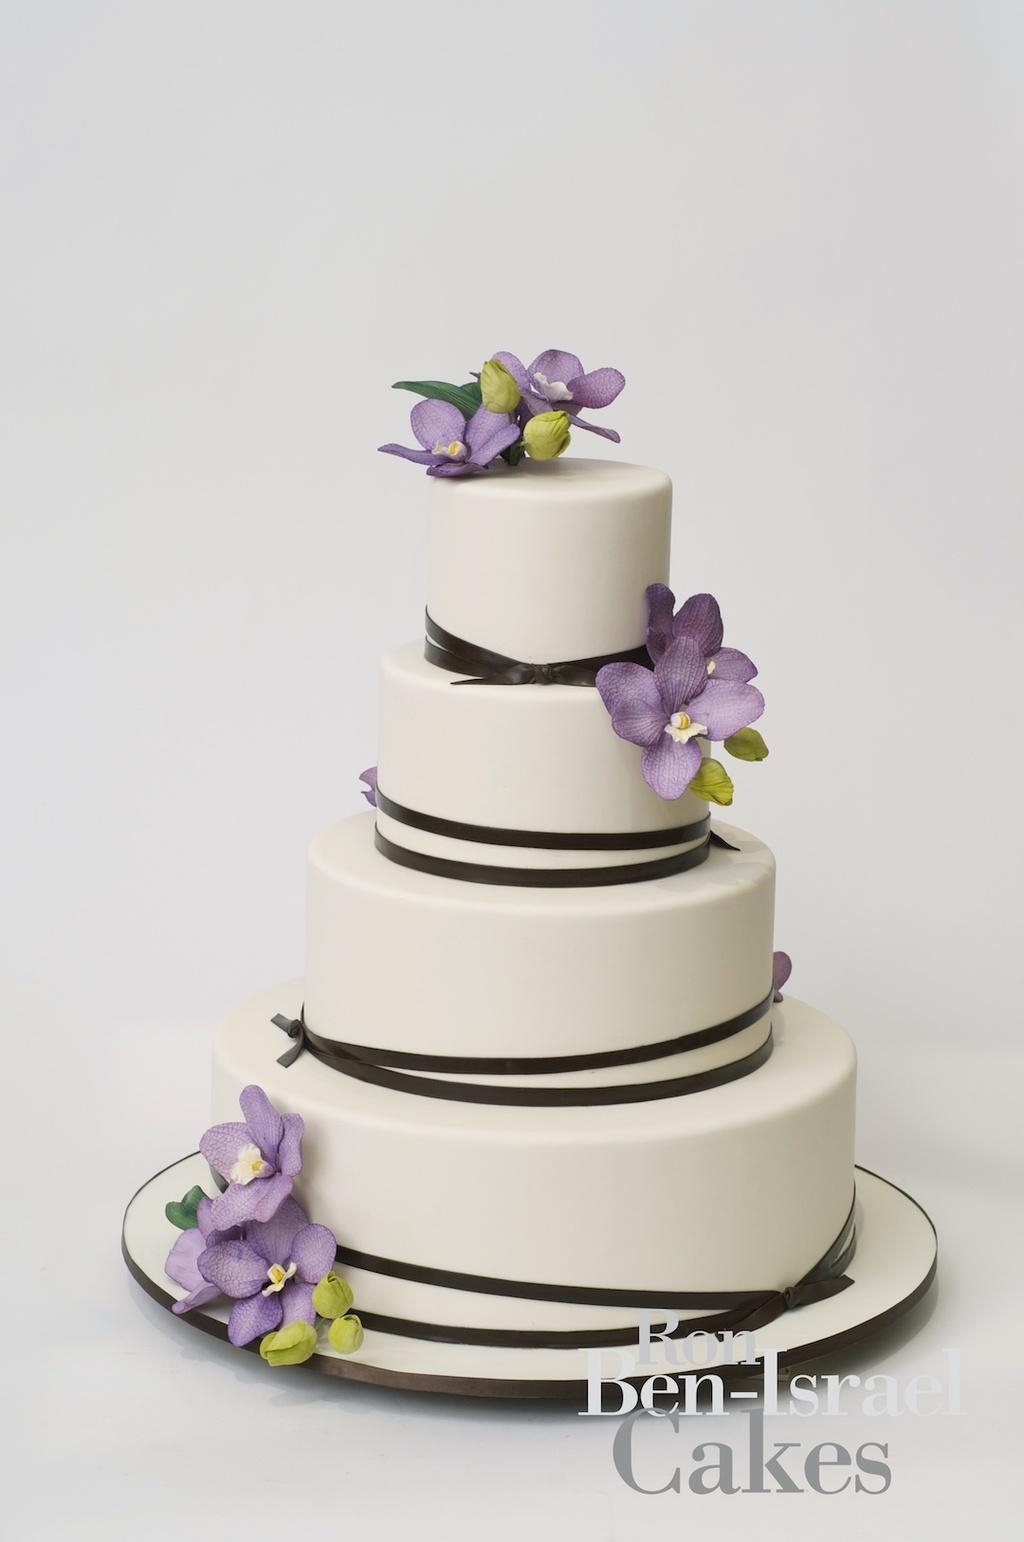 BenIsrael Cakes - Ben Israel Wedding Cakes